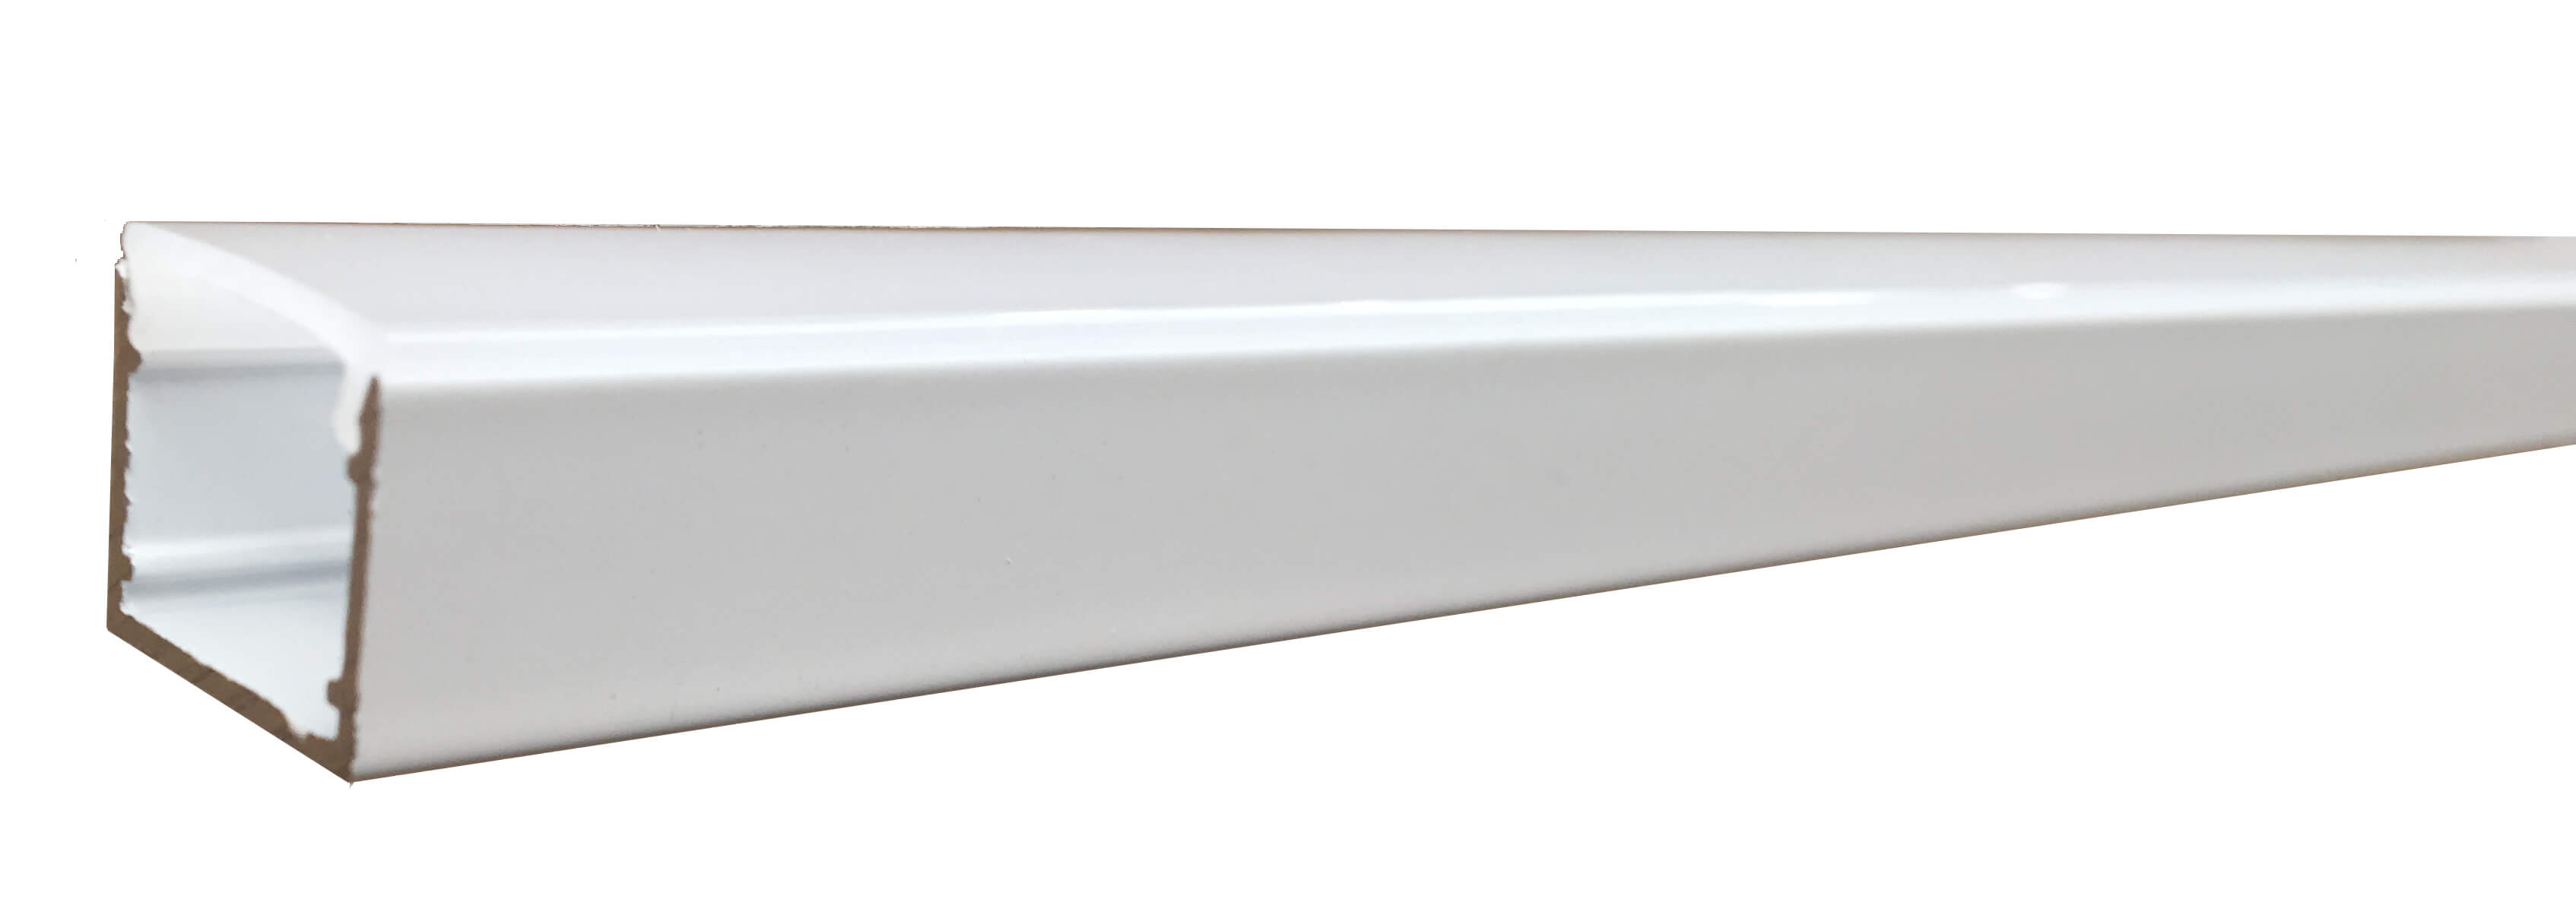 Integratech alu baseline aluminium led strip profiel accessoires